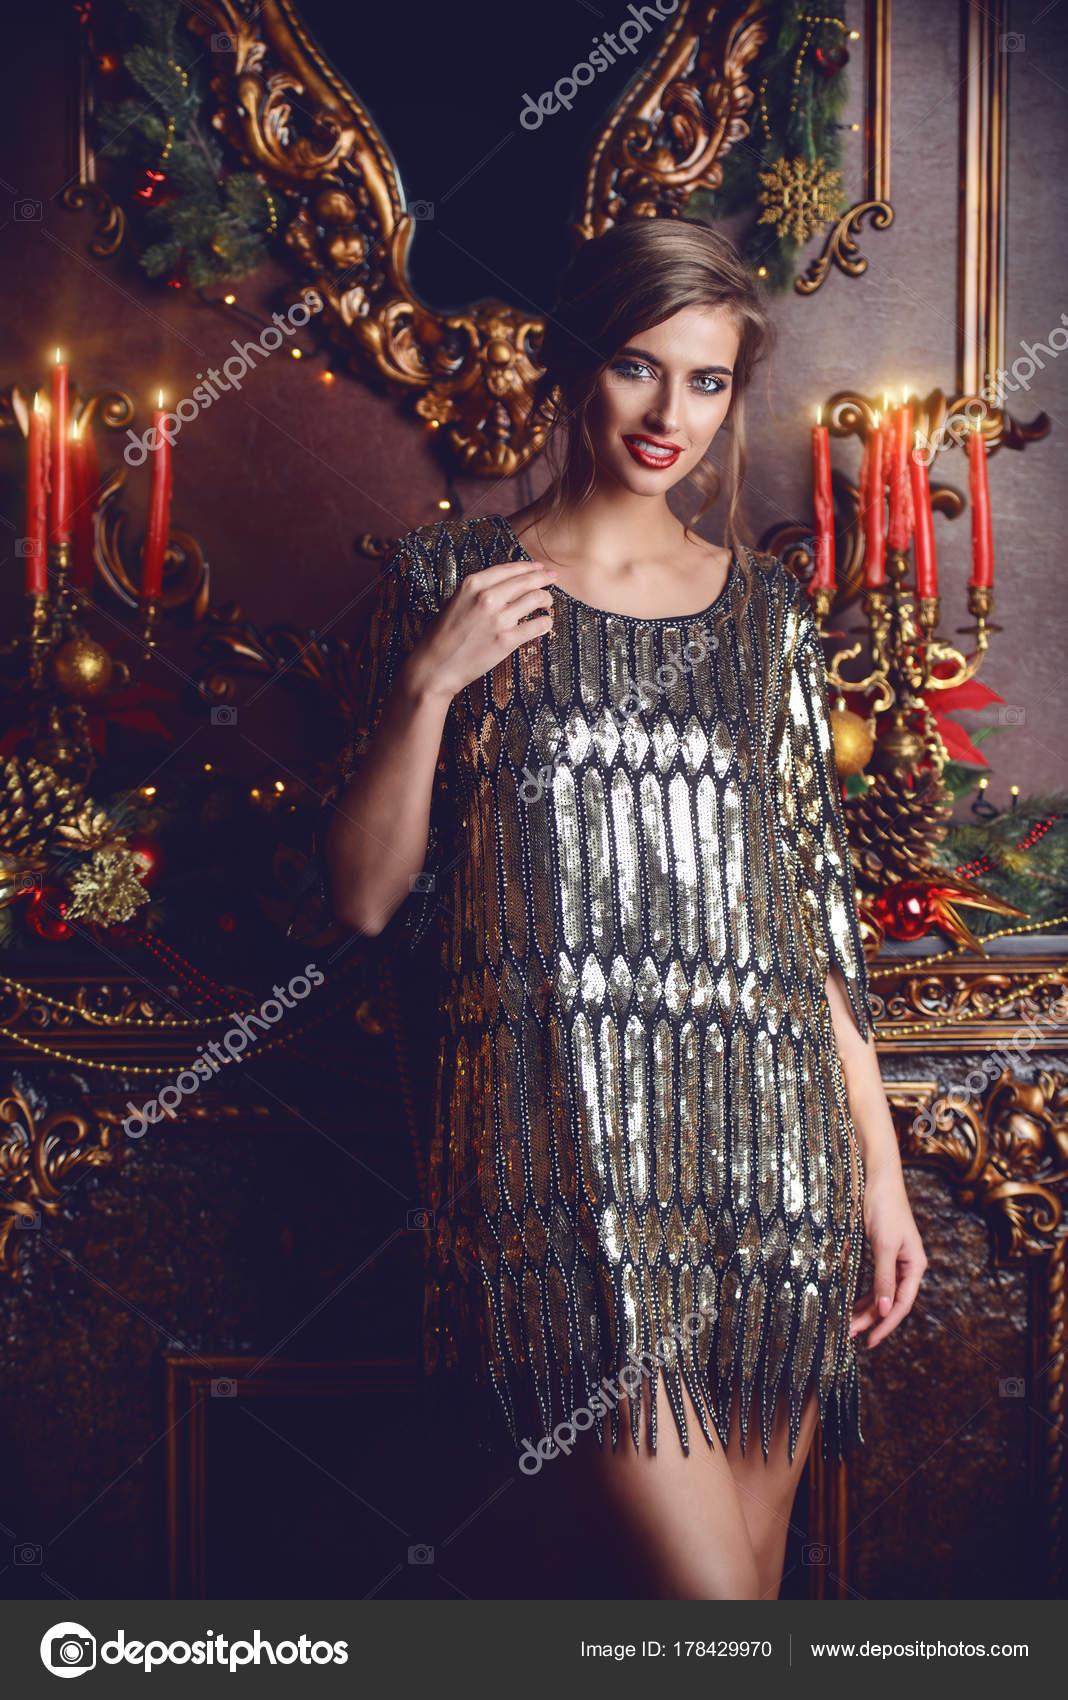 52df2968d7bf Κυρία στο βραδινό ντύσιμο — Φωτογραφία Αρχείου © prometeus  178429970